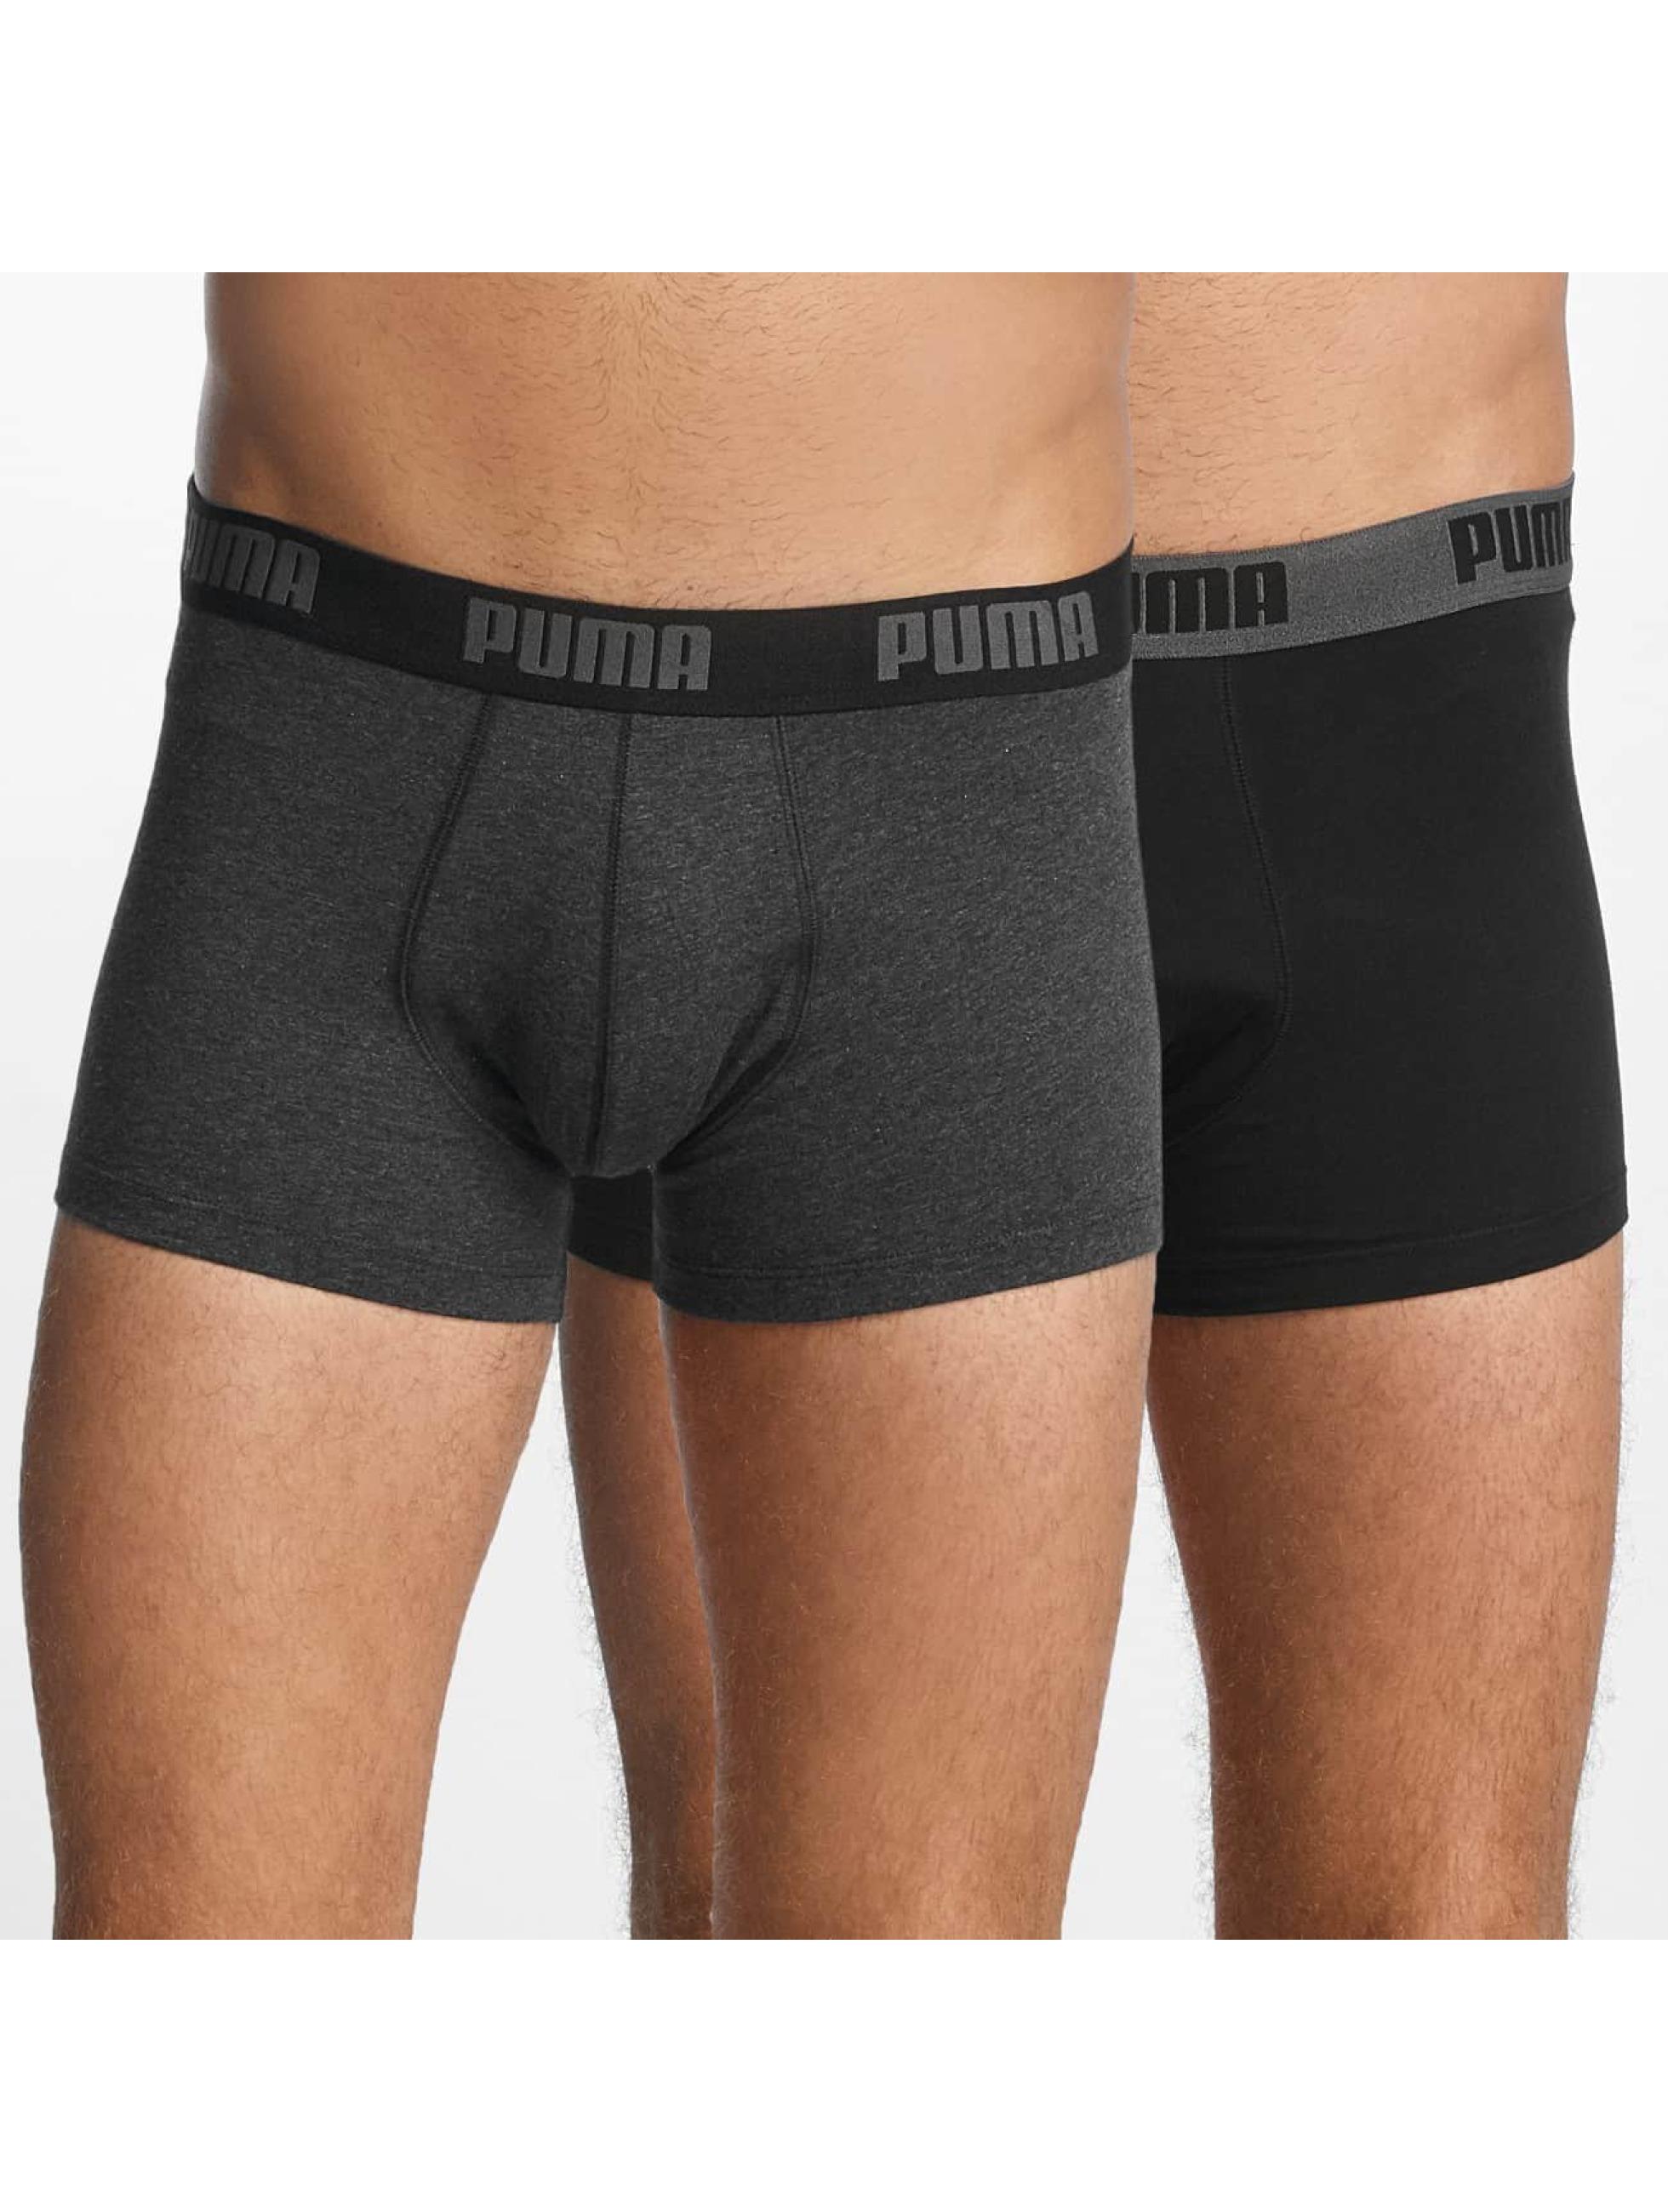 Puma boxershorts 2-Pack Basic Trunk grijs